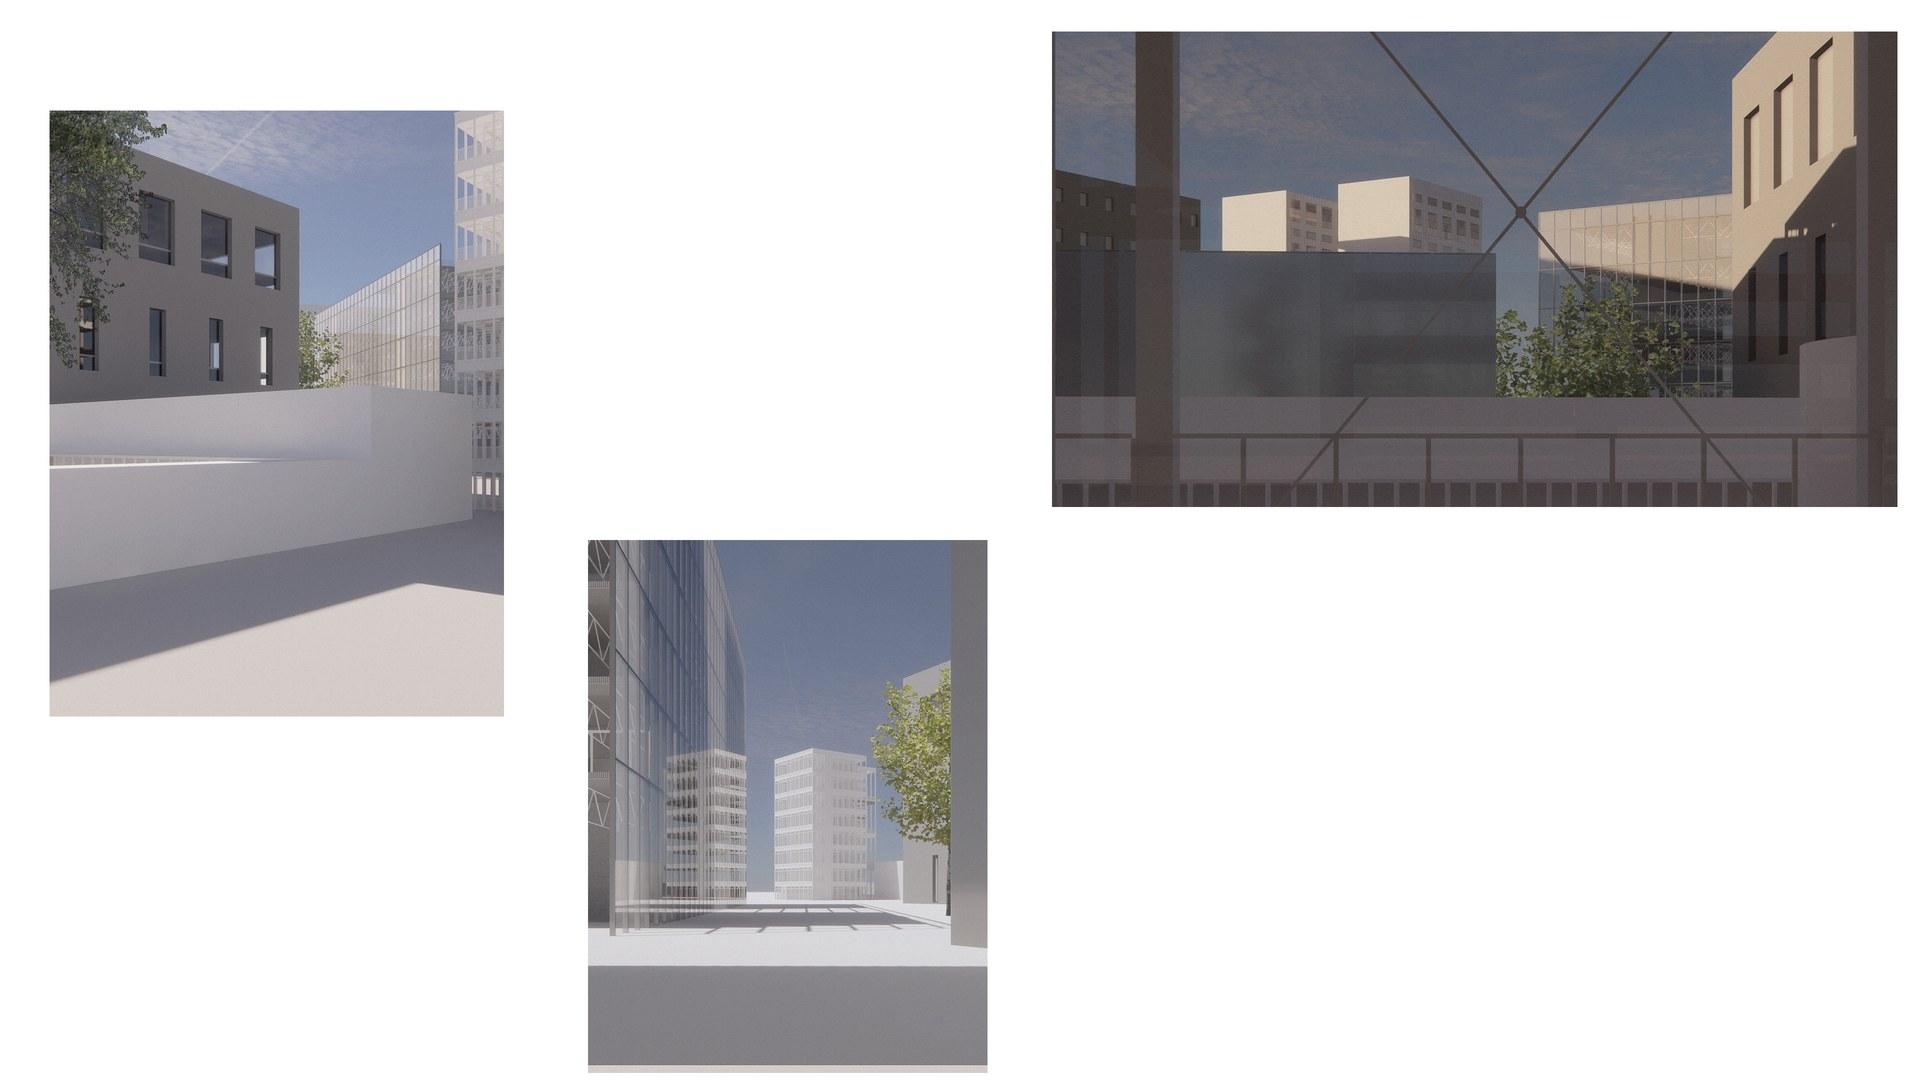 Building in context